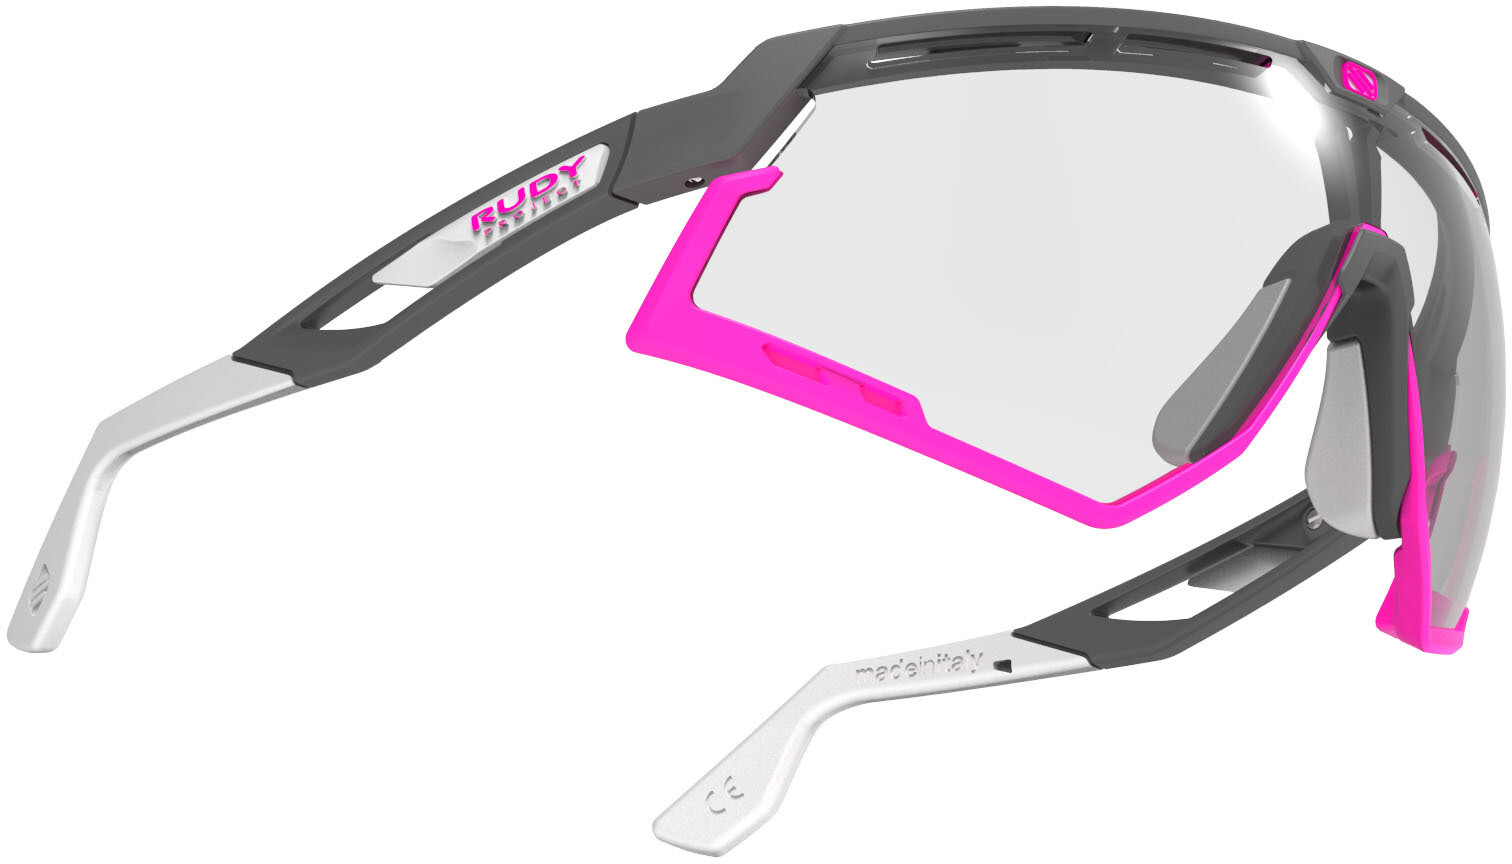 8347308b93e Rudy Project Defender Cykelglasögon pyombo matte/fuxia - impactx  photochromic 2 black